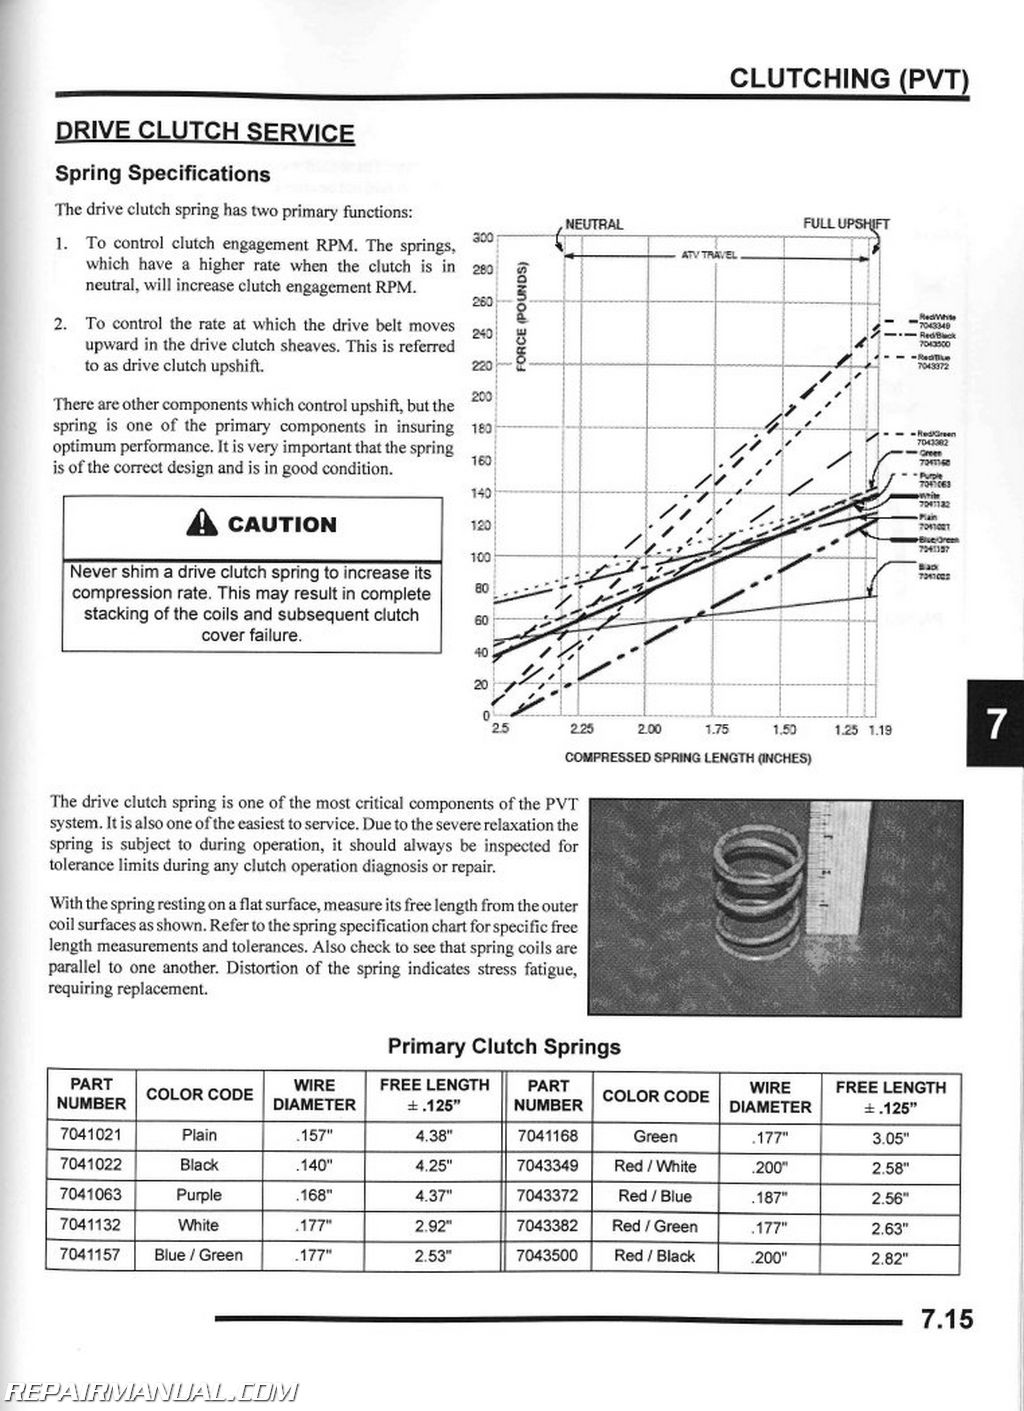 2010 polaris sportsman xp 550 atv service manual 9922468 2010 polaris sportsman xp 550 atv service manual